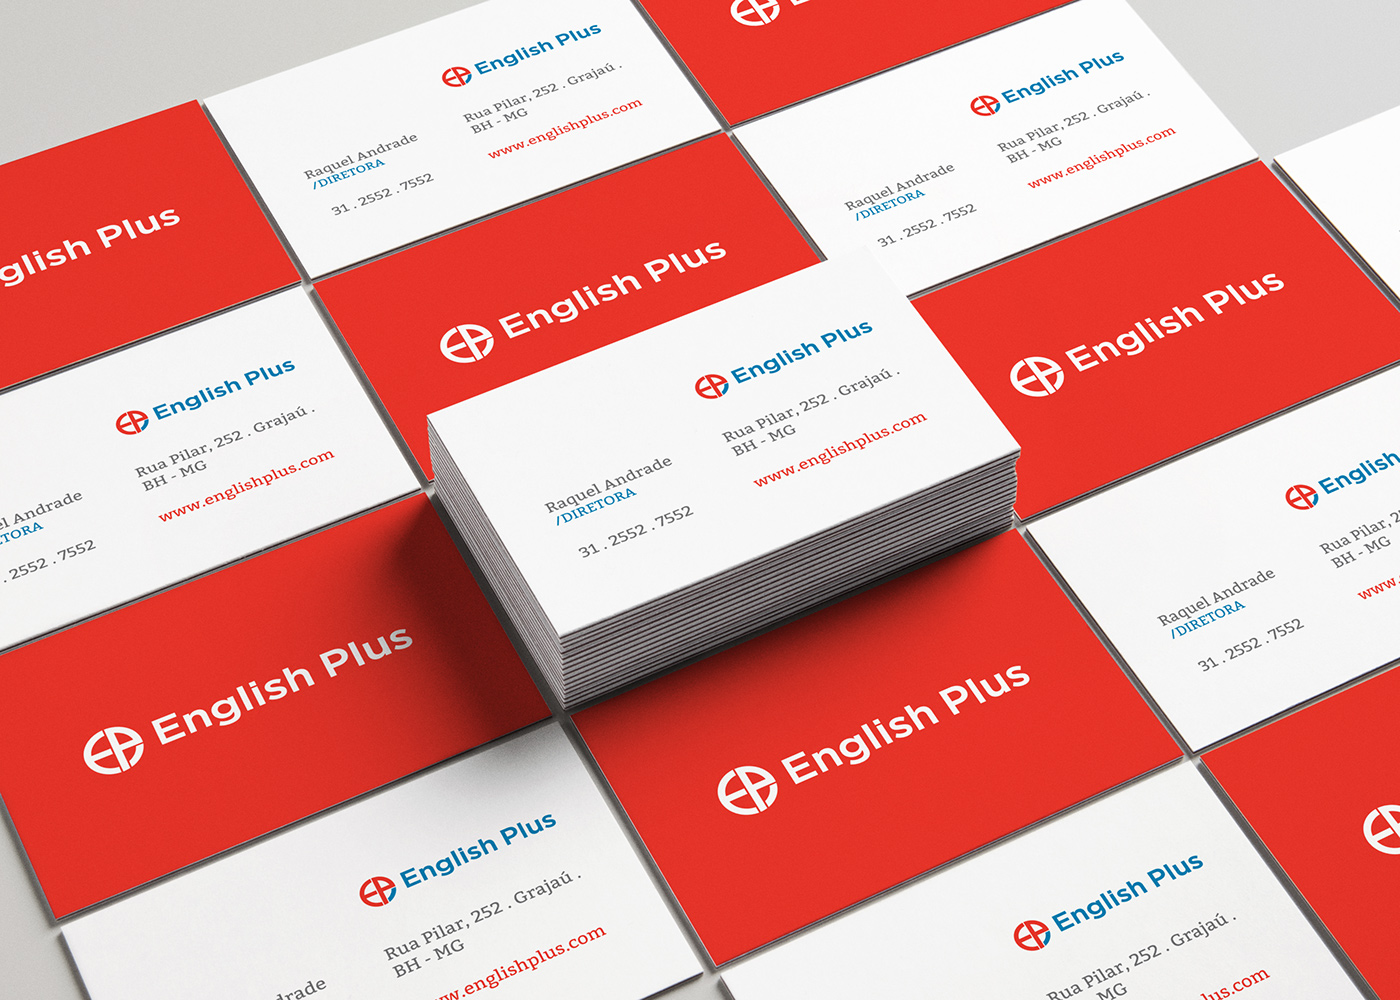 English Plus . Logo Redesign